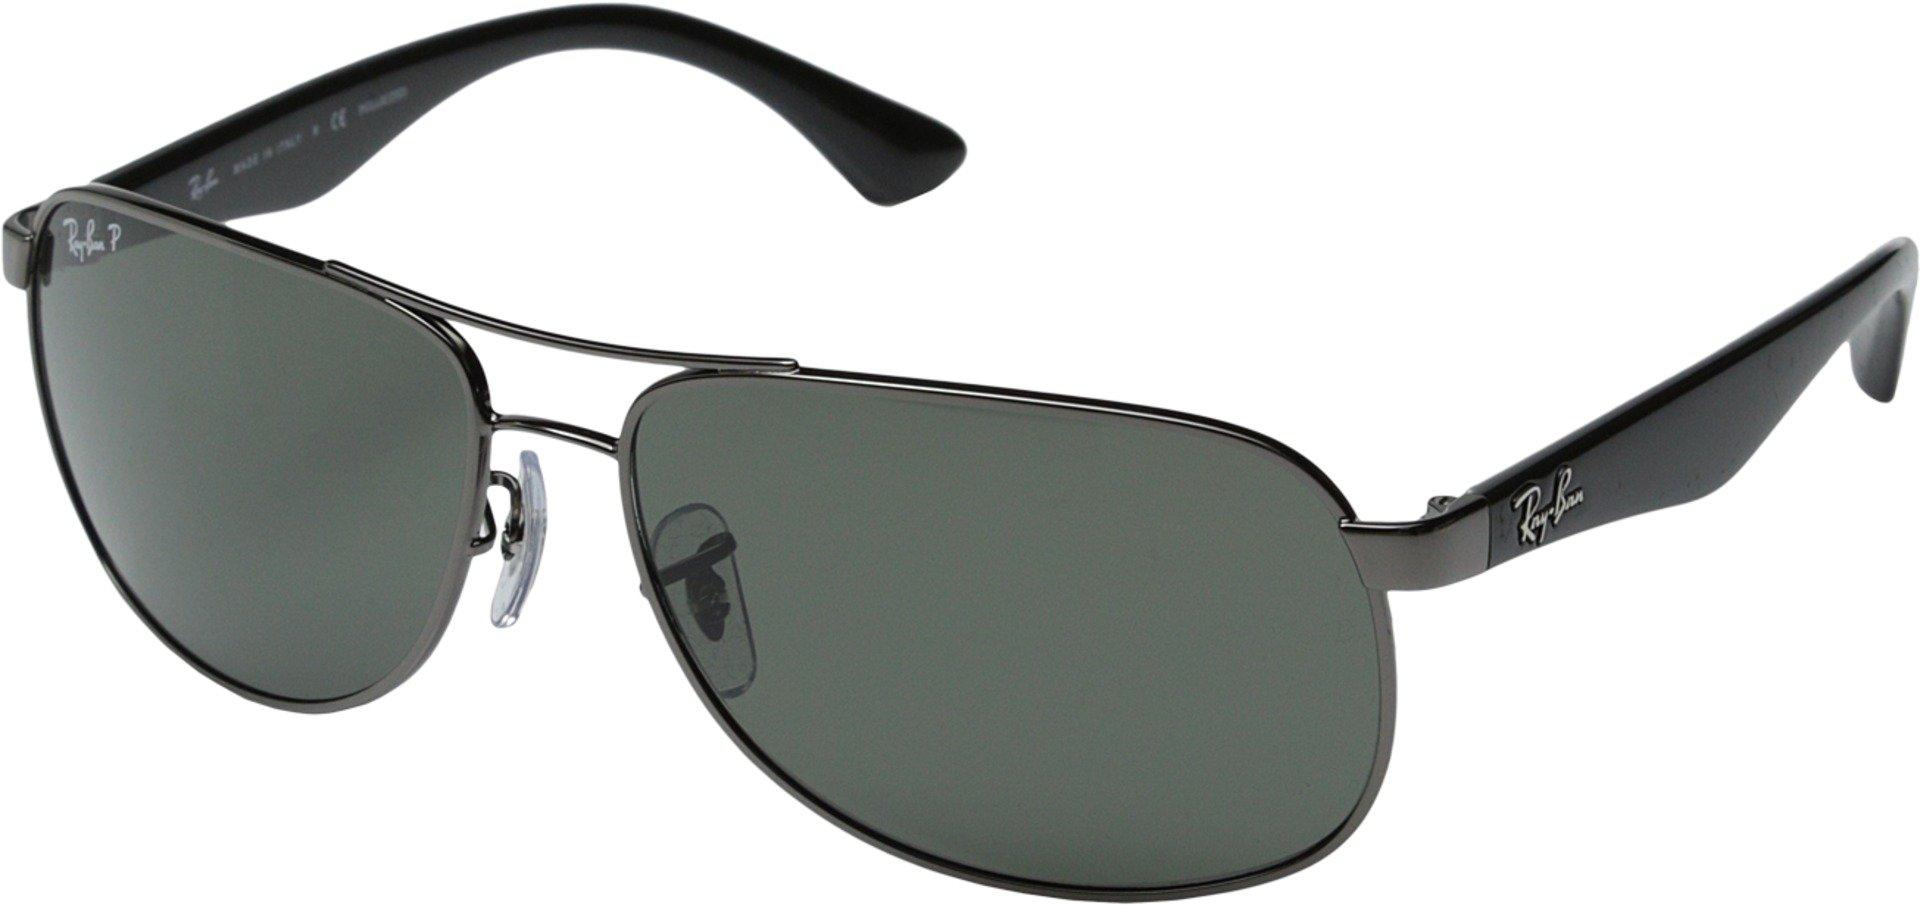 RAY-BAN Men's RB3502 Rectangular Metal Sunglasses, Gunmetal/Polarized Green, 61 mm by RAY-BAN